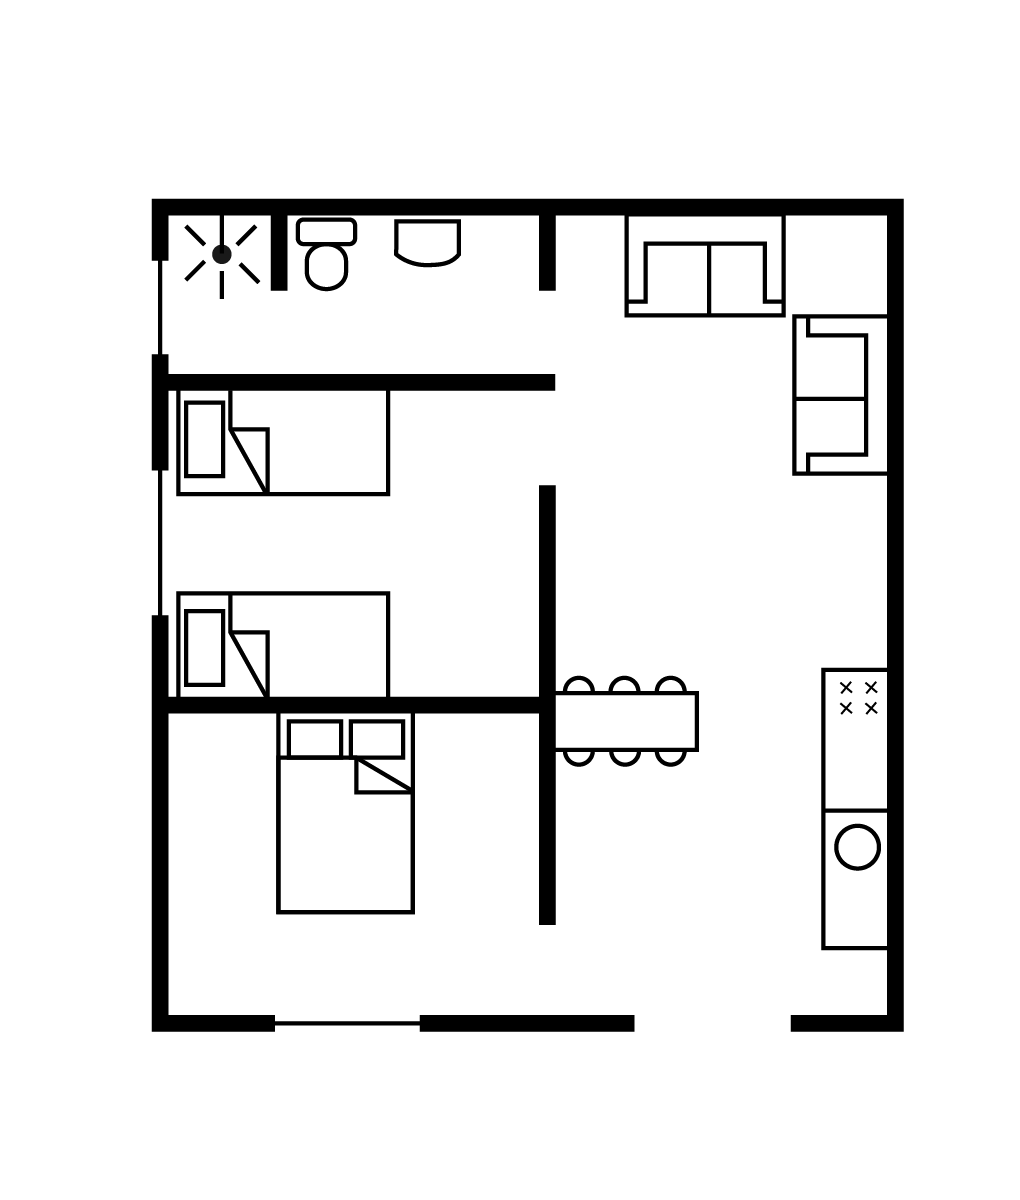 plattegrond-appartementen-1